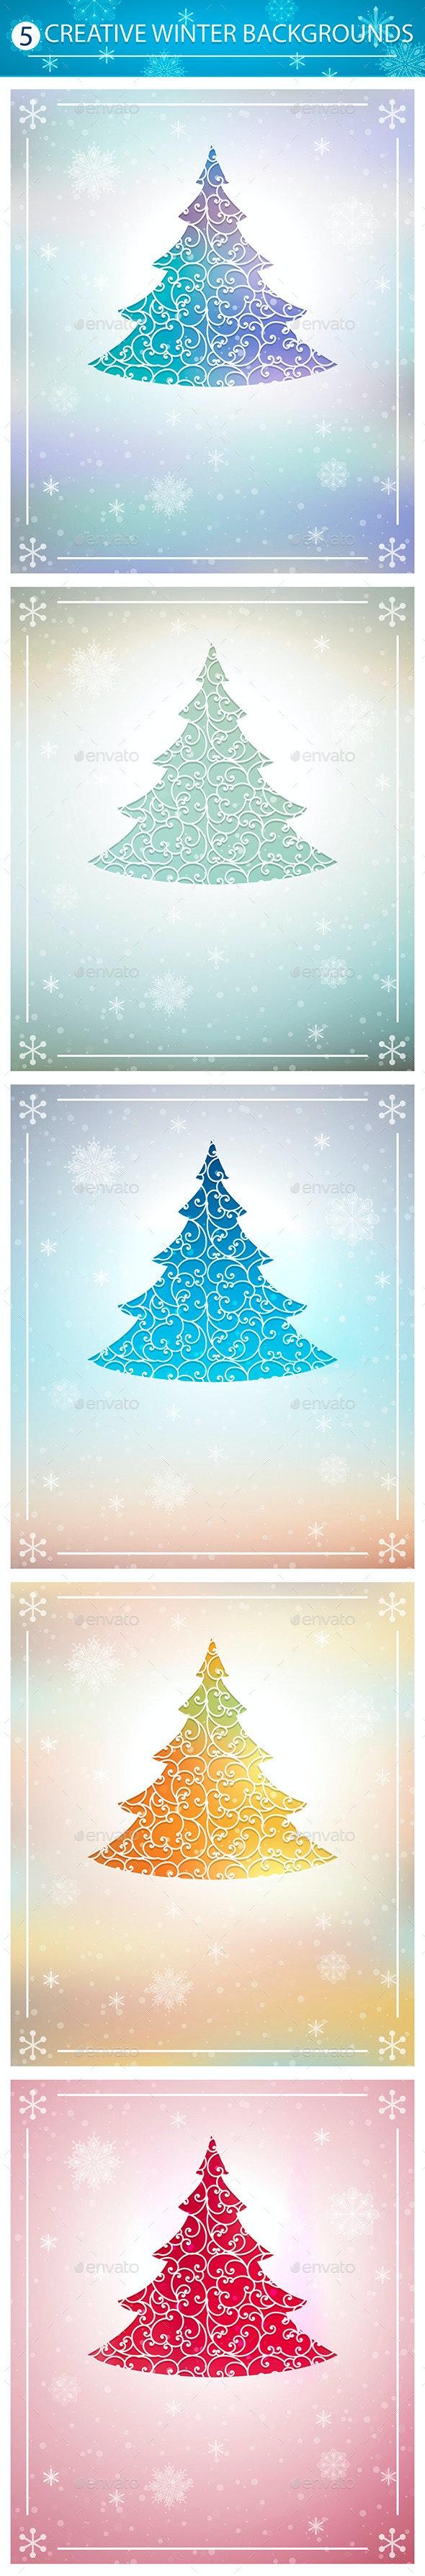 Winter Backgrounds Set - New Year Seasons/Holidays